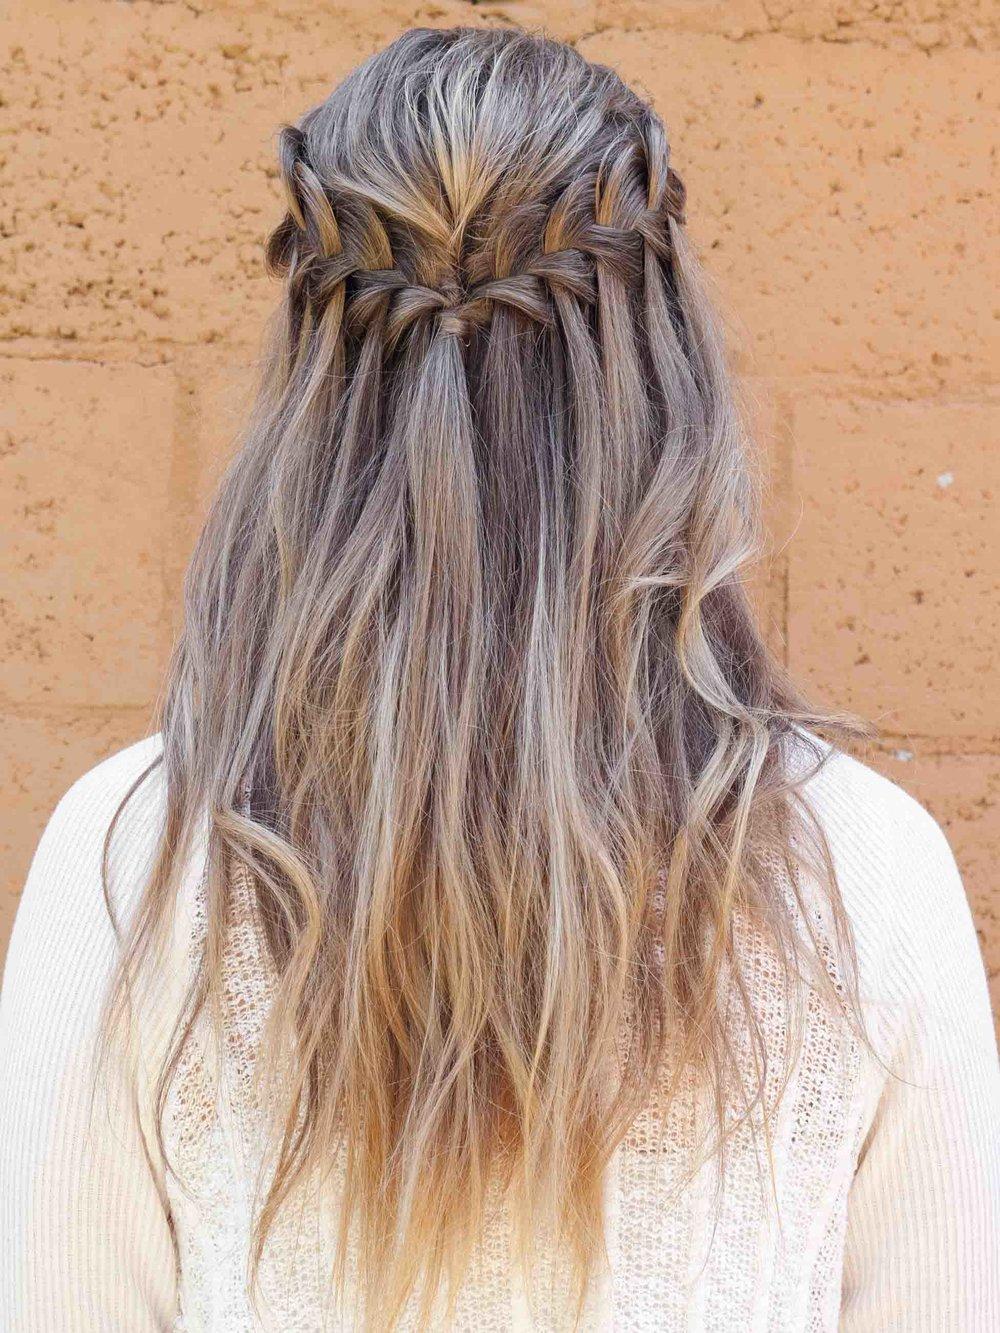 talia-whatcott-makeup-artist-portfolio-blog-hair-waterfall-braid-smoky-eye-matte-lip-bridal-wedding-tousled-curls-1-3.jpg